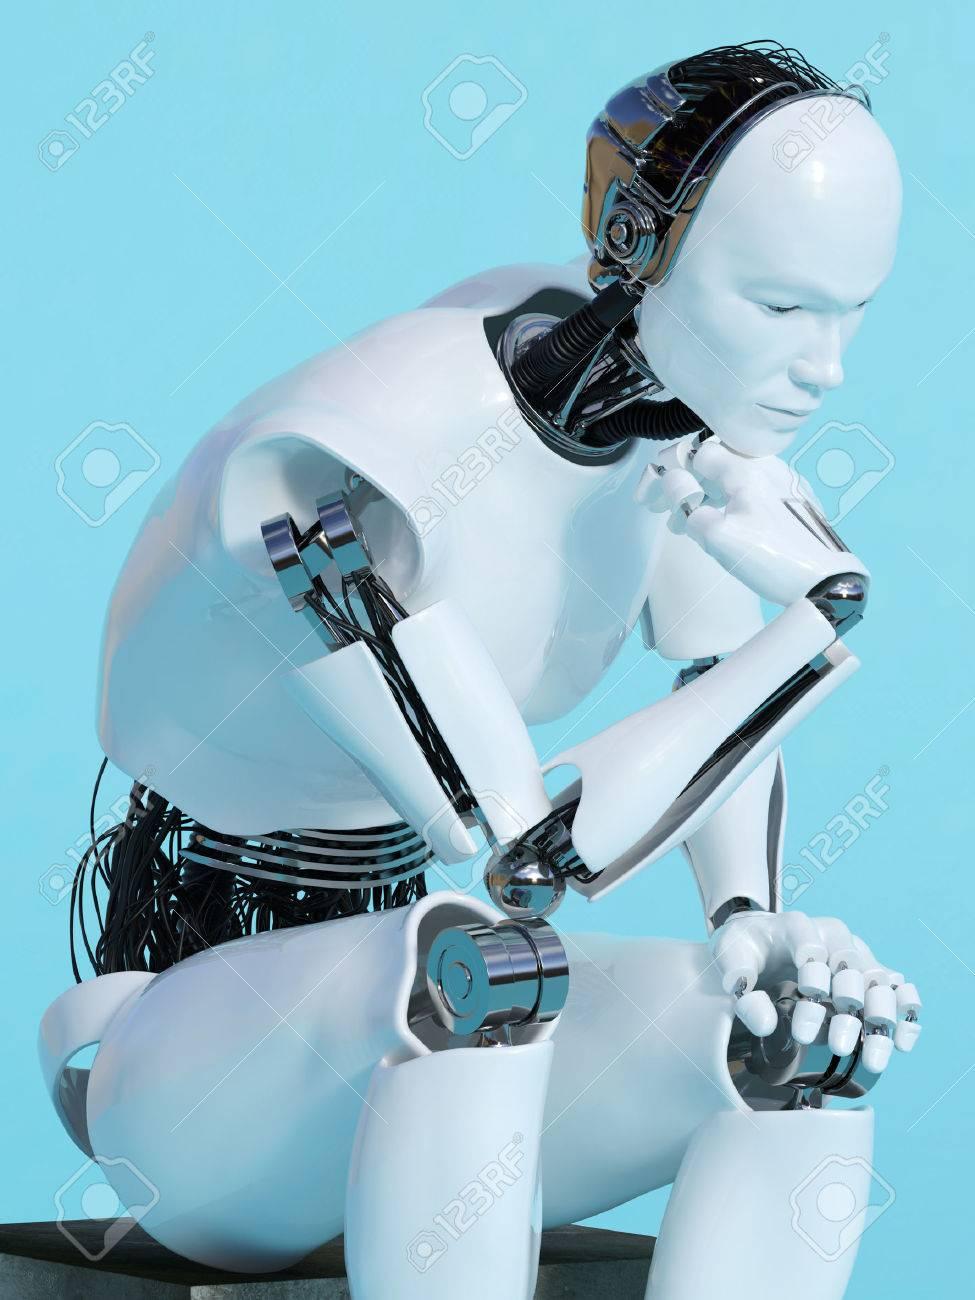 Cognitive machine intelligence